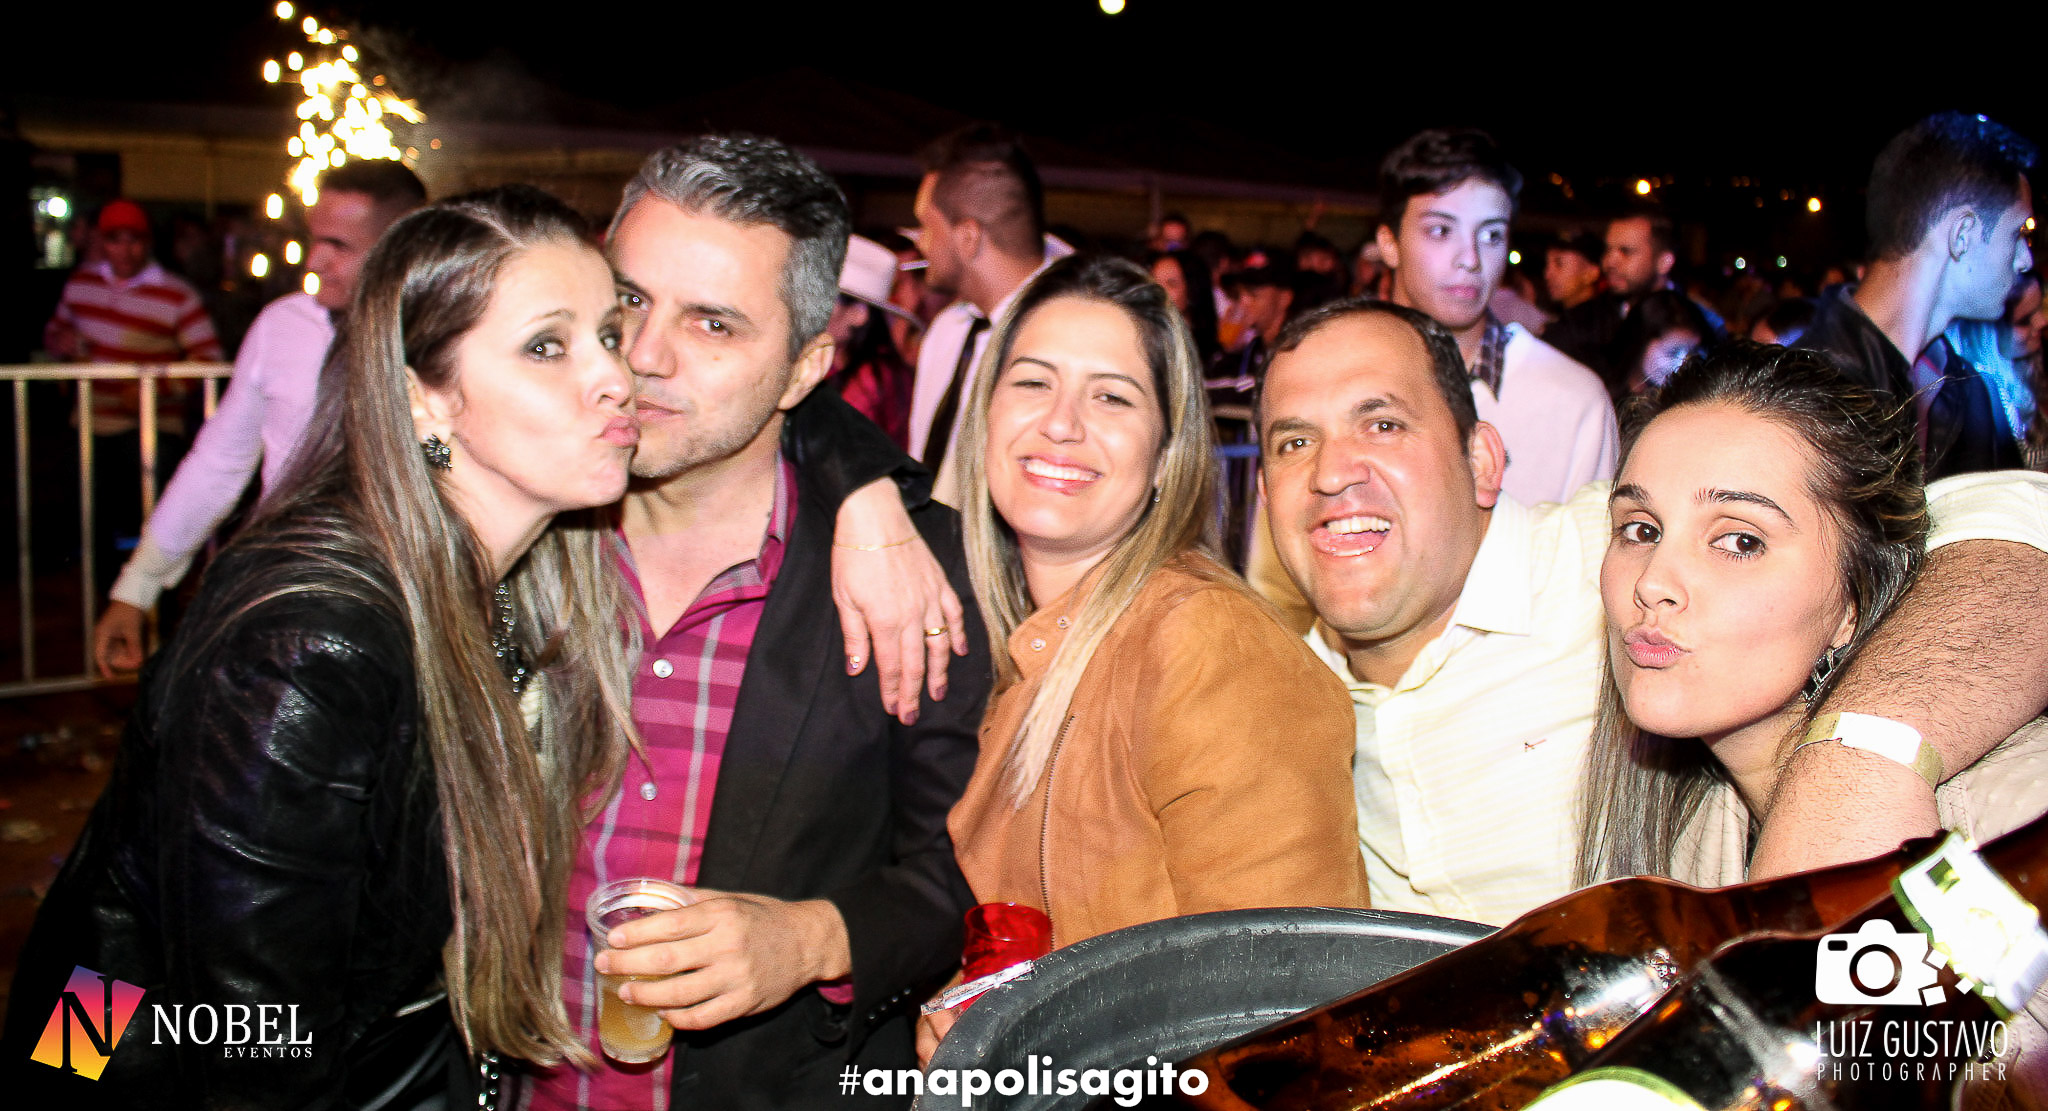 Luiz Gustavo Photographer-133